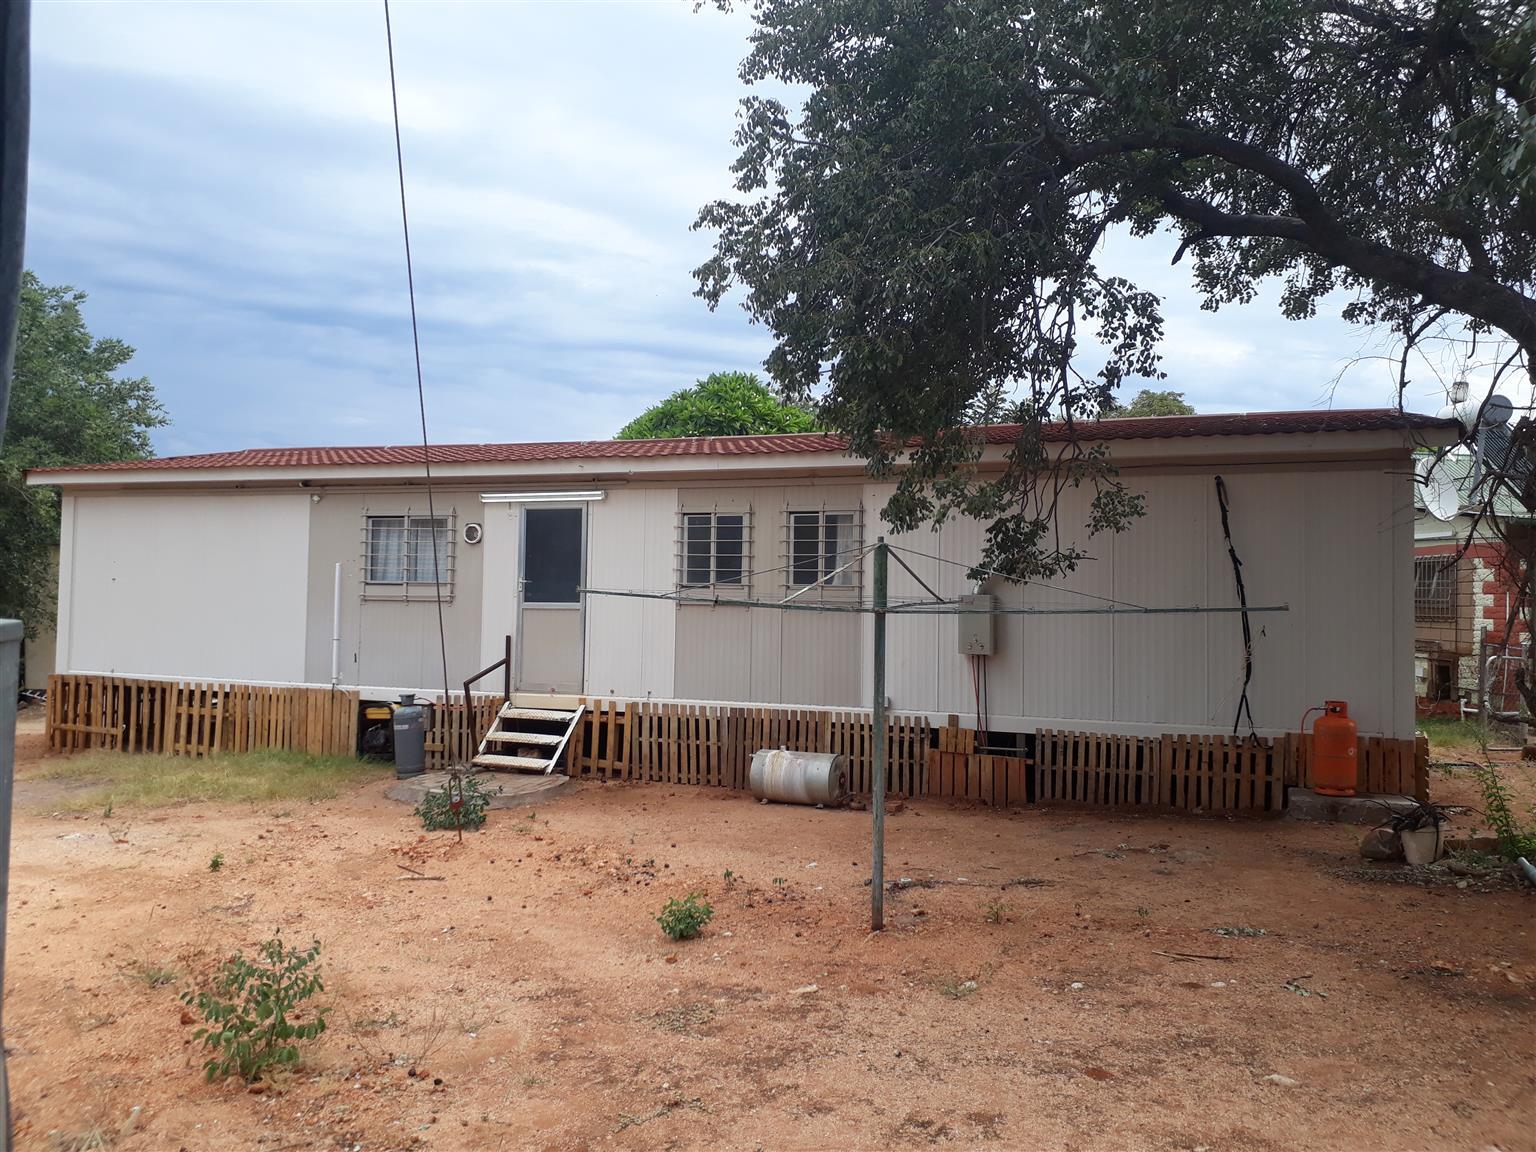 Parkhome for sale in Soutpansberg